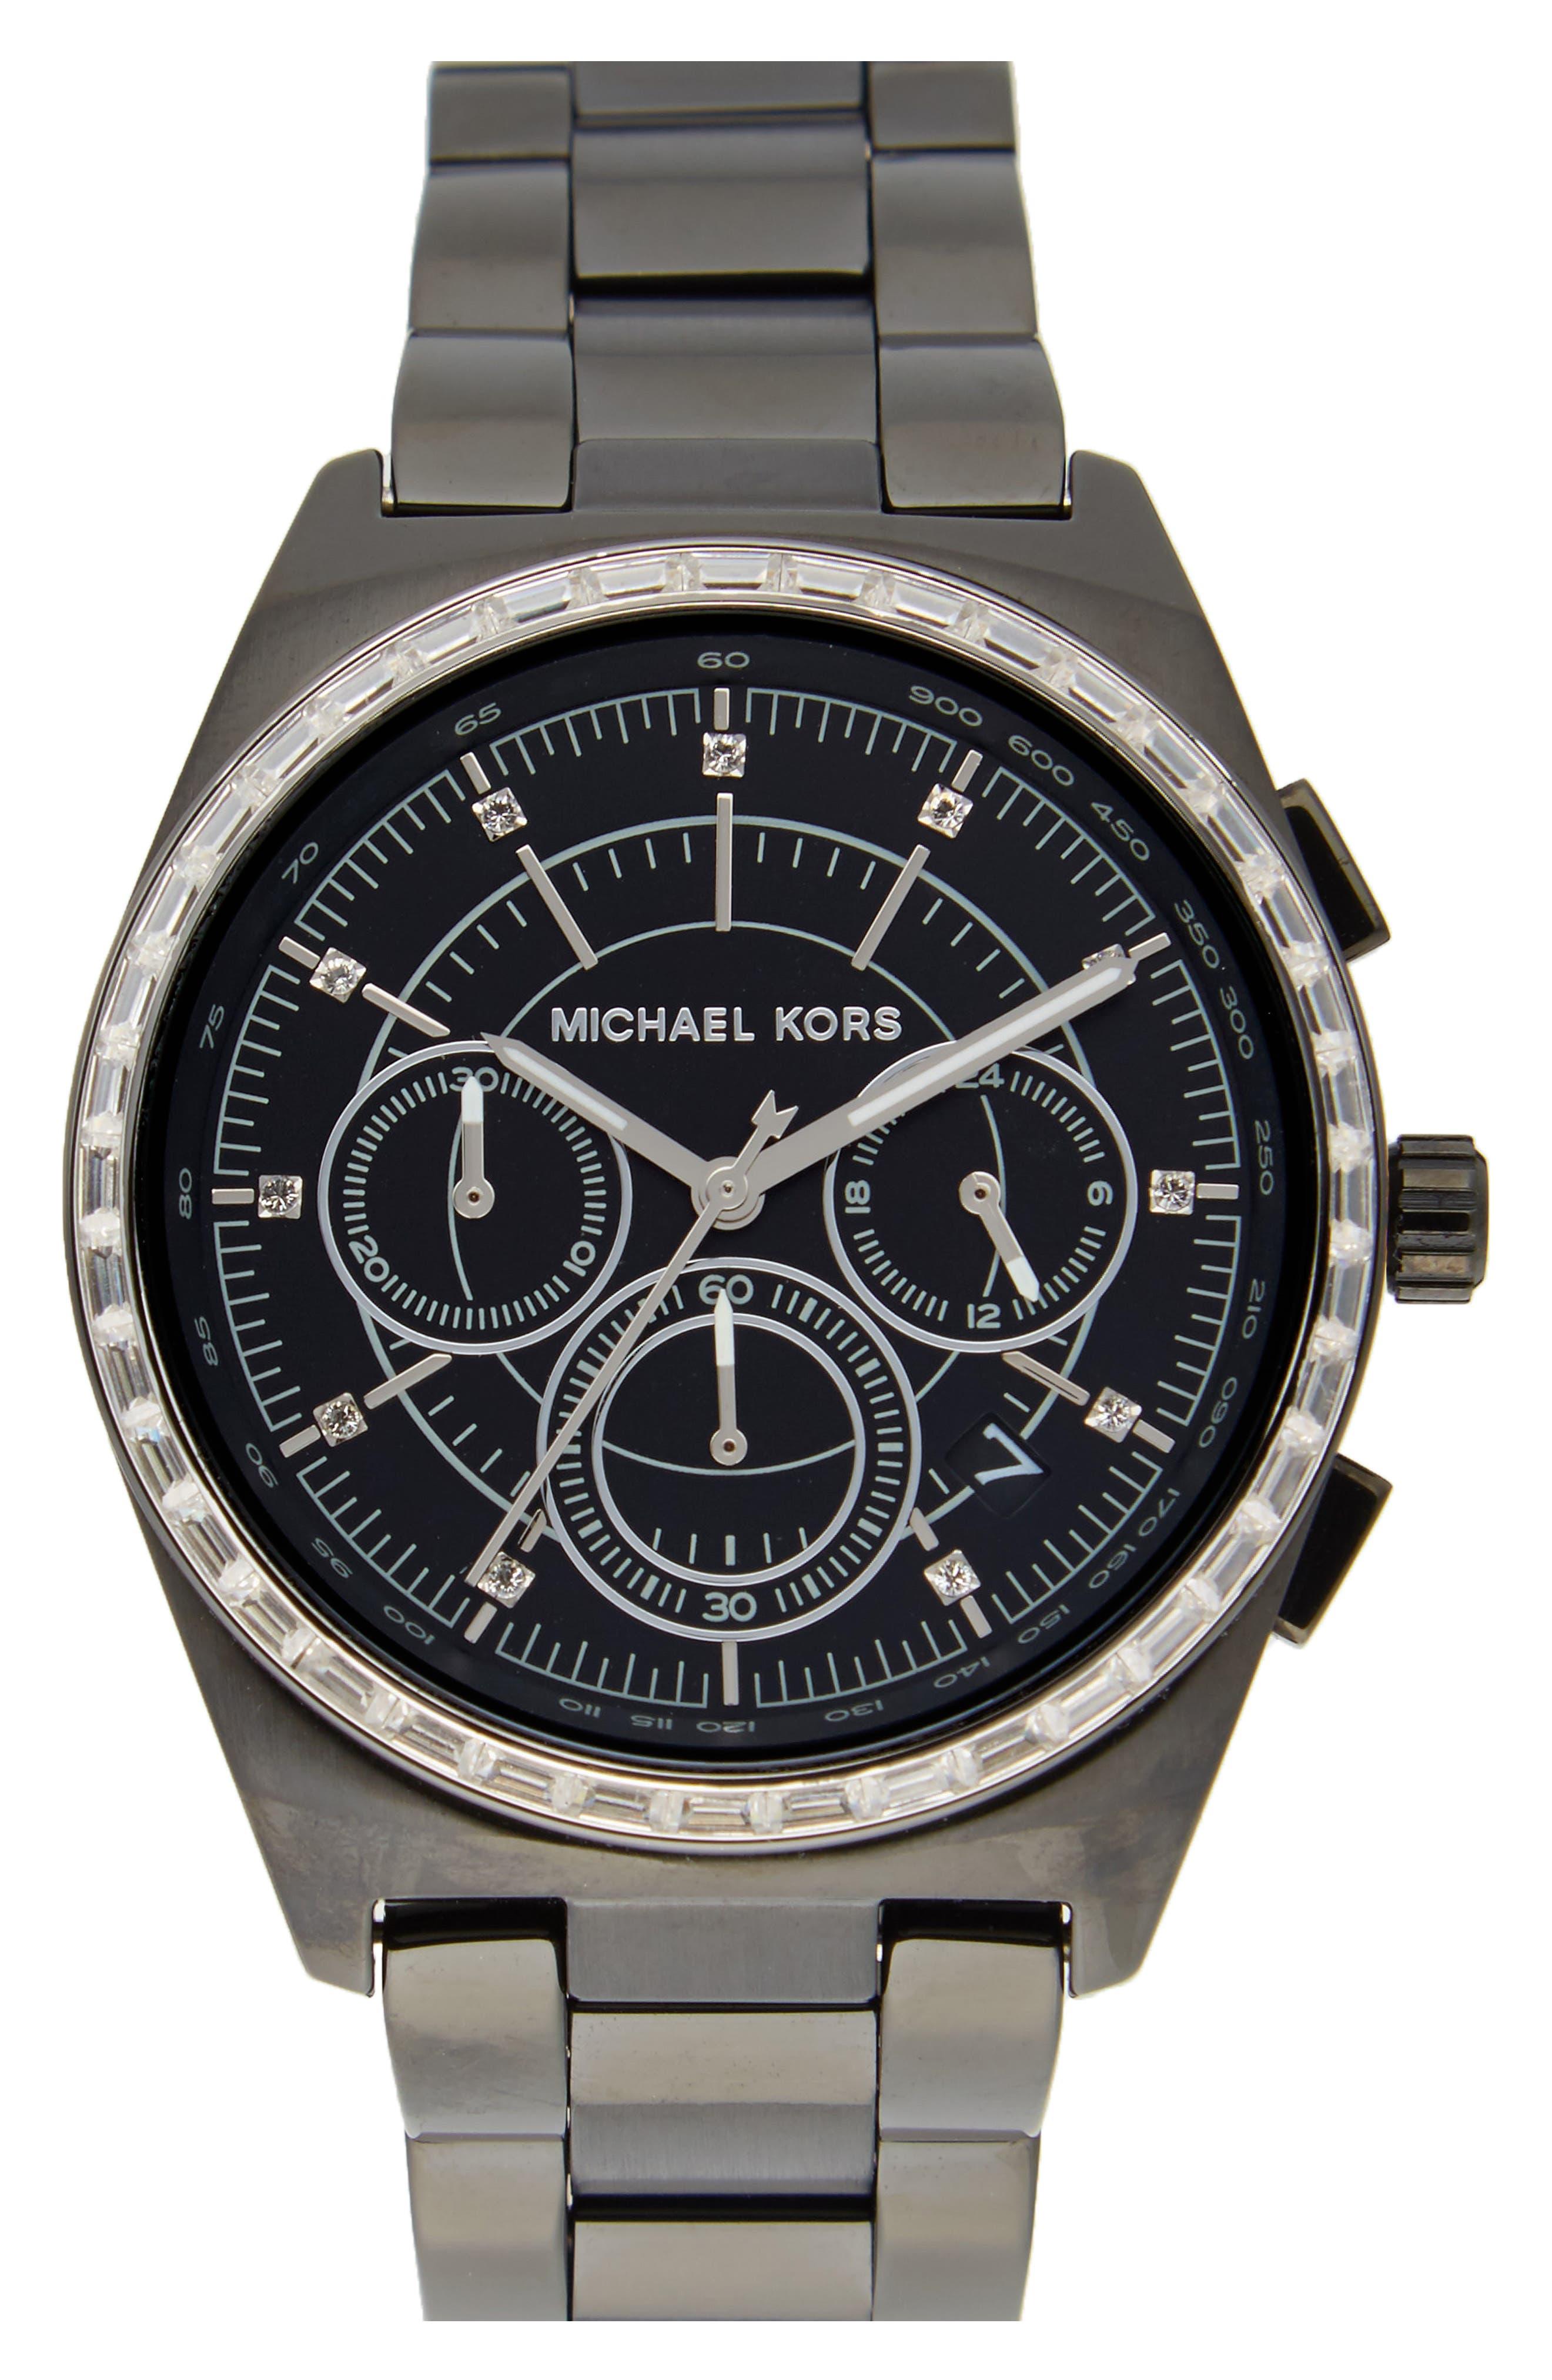 KORS Michael Kors Vail Chronograph Bracelet Watch, 38mm